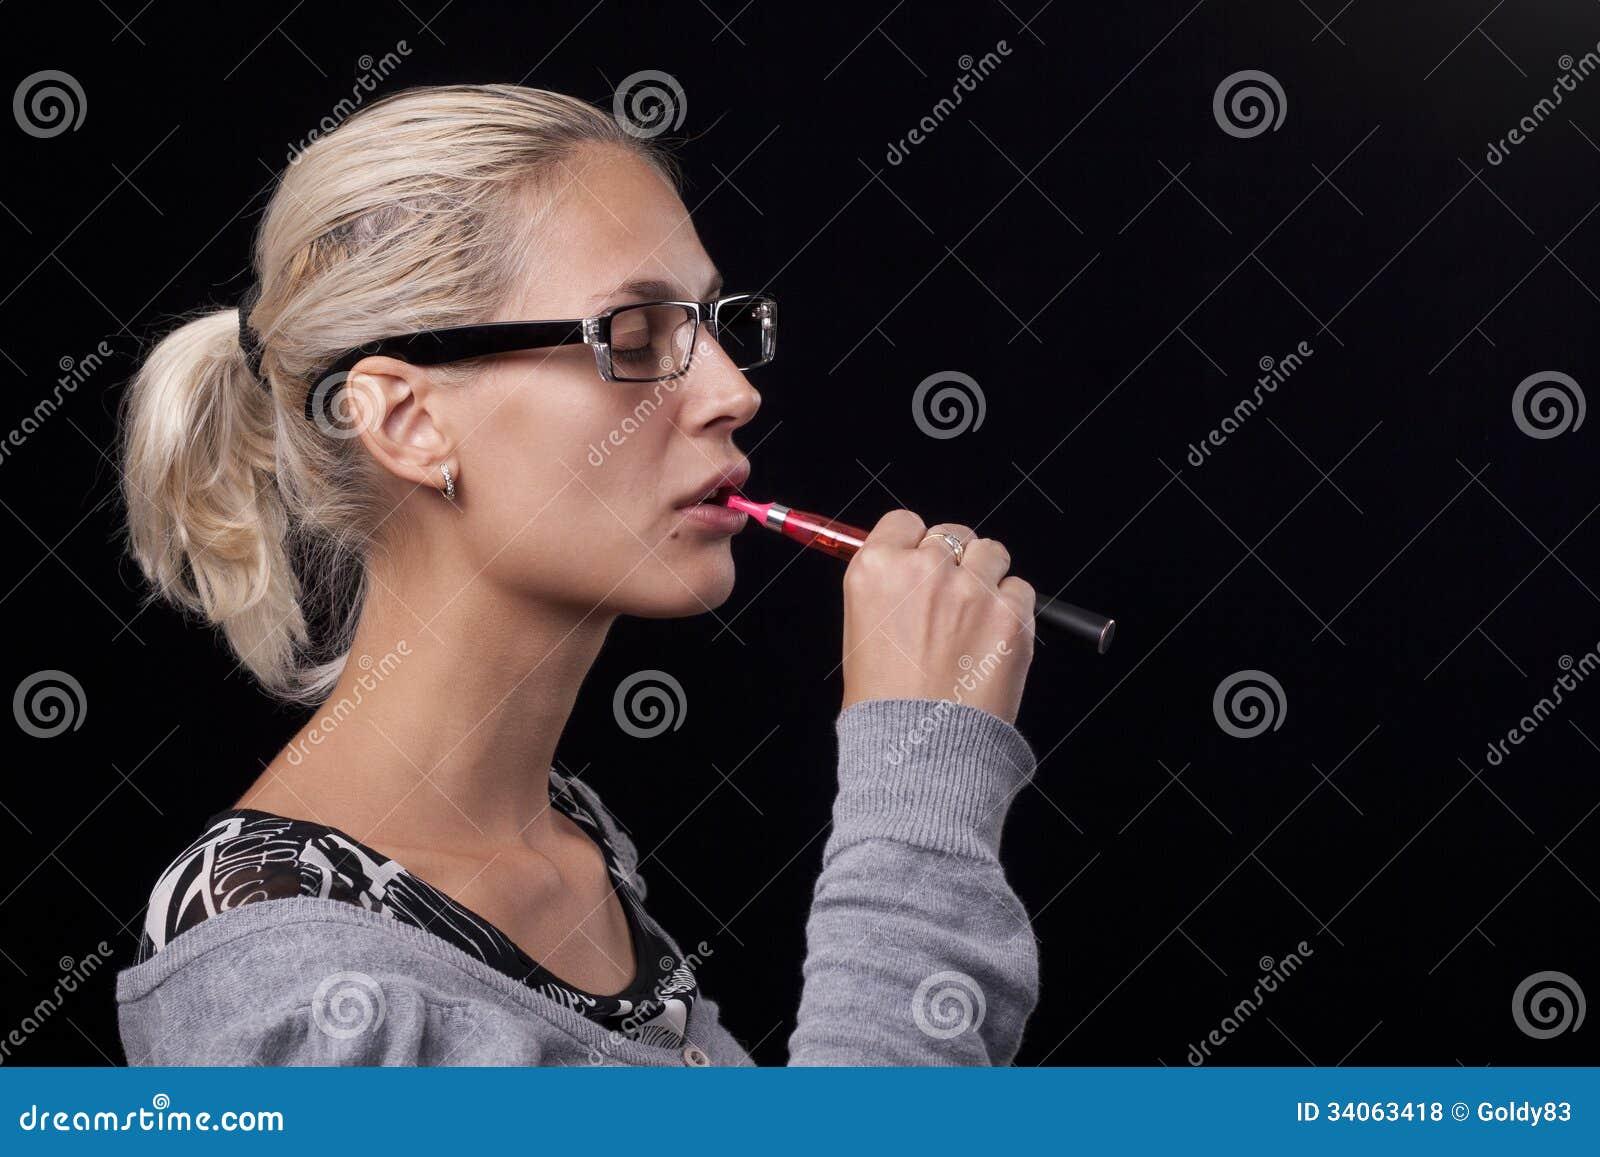 Smoking Electric Cigarettes Royalty Free Stock Photos ...